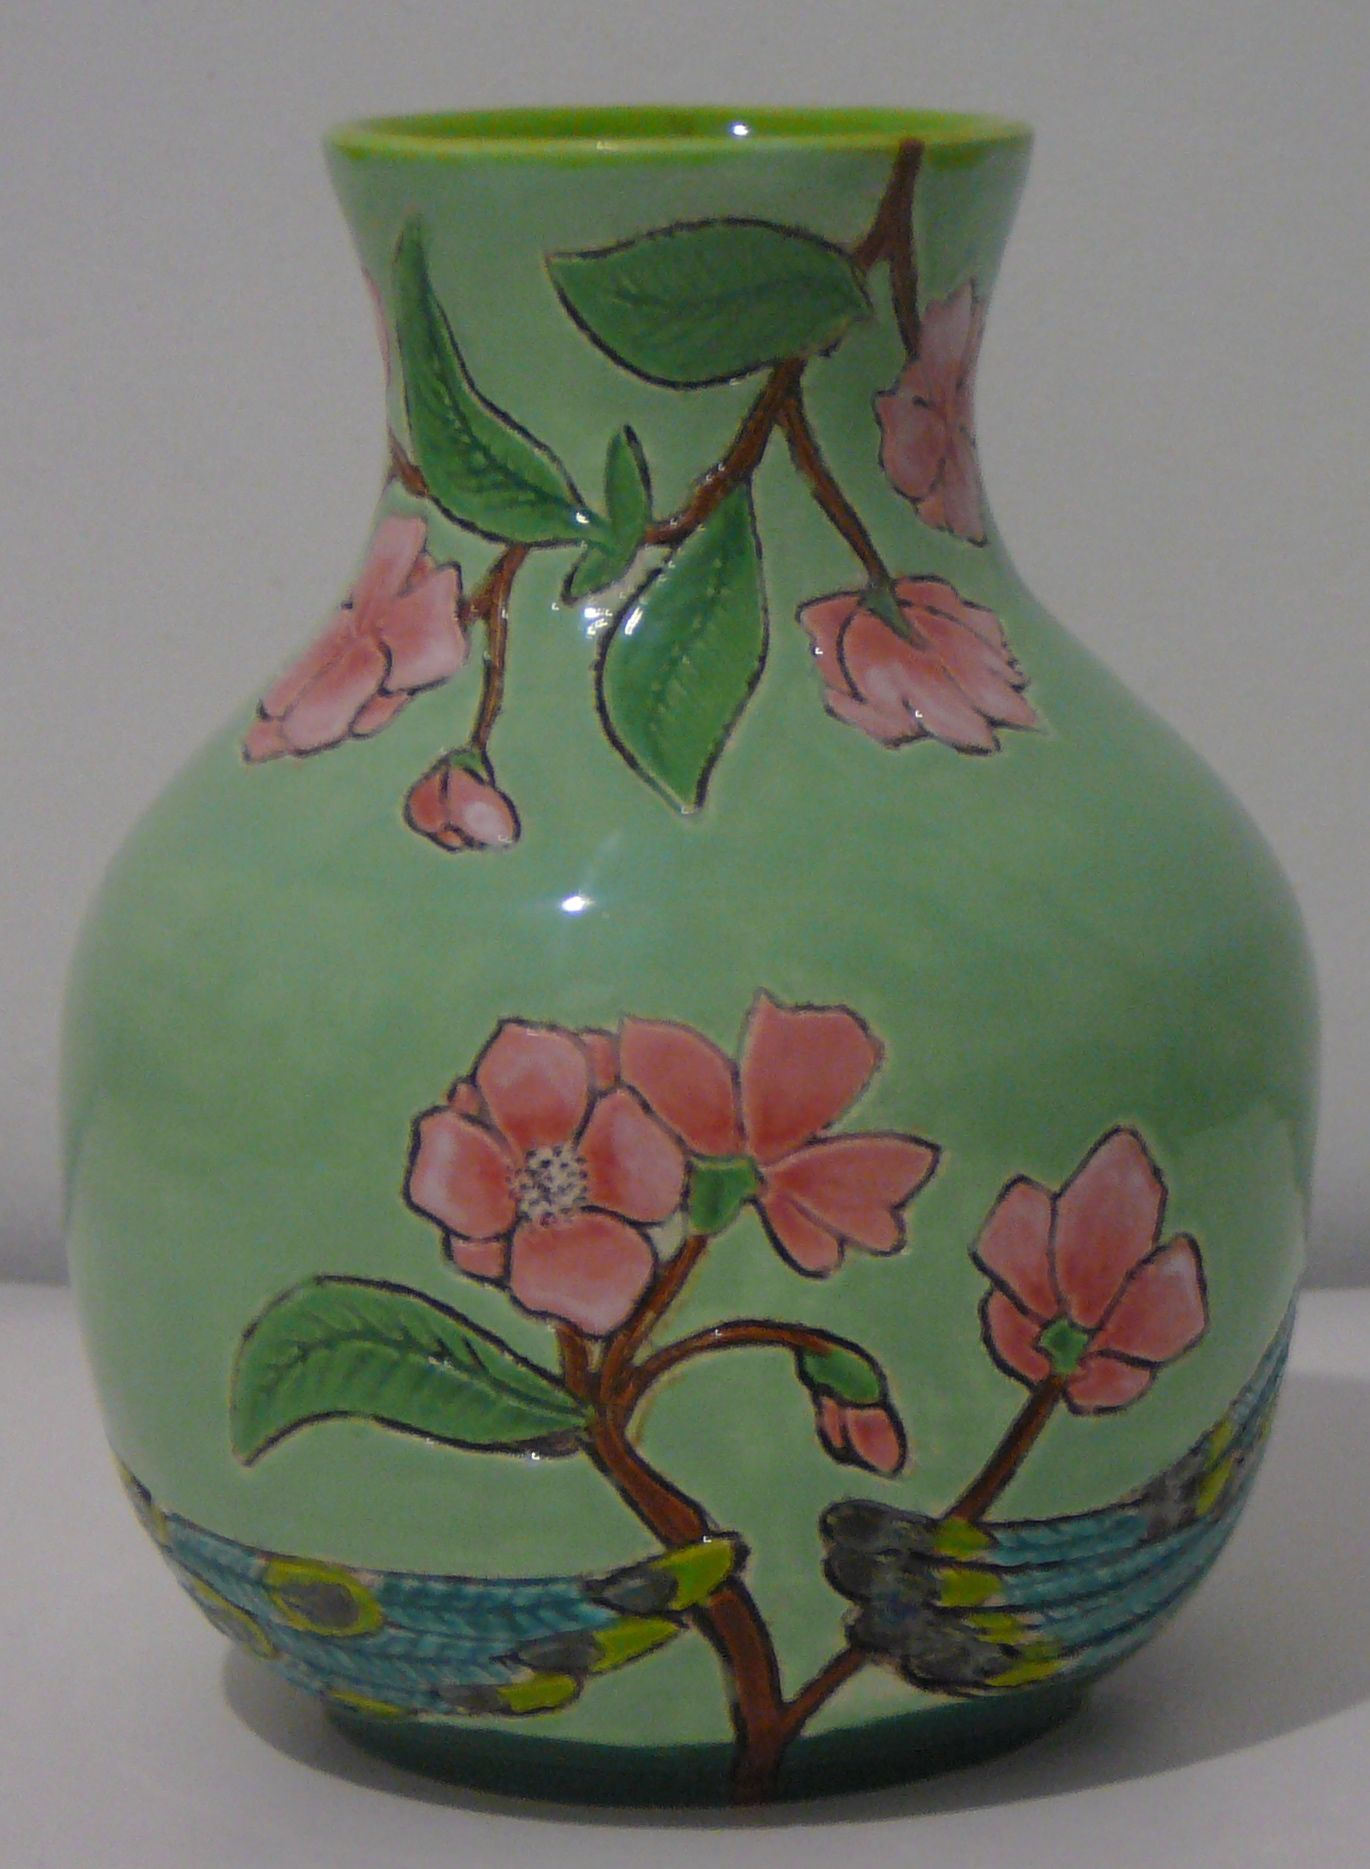 Peacock vase (backside) thrown, turned, carved and glazed July 2012